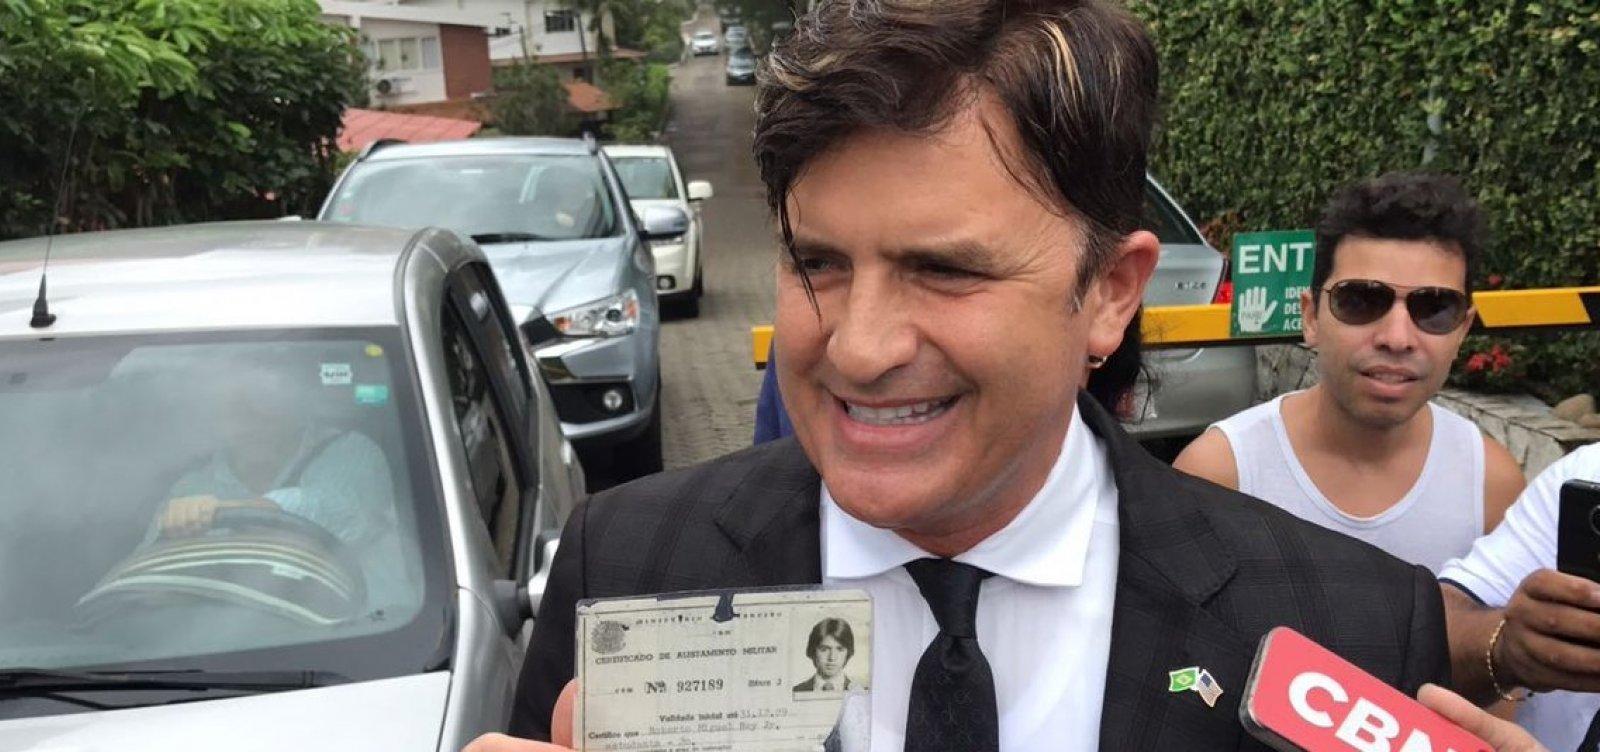 [Dr. Rey visita Bolsonaro e diz que quer ser ministro da Saúde]